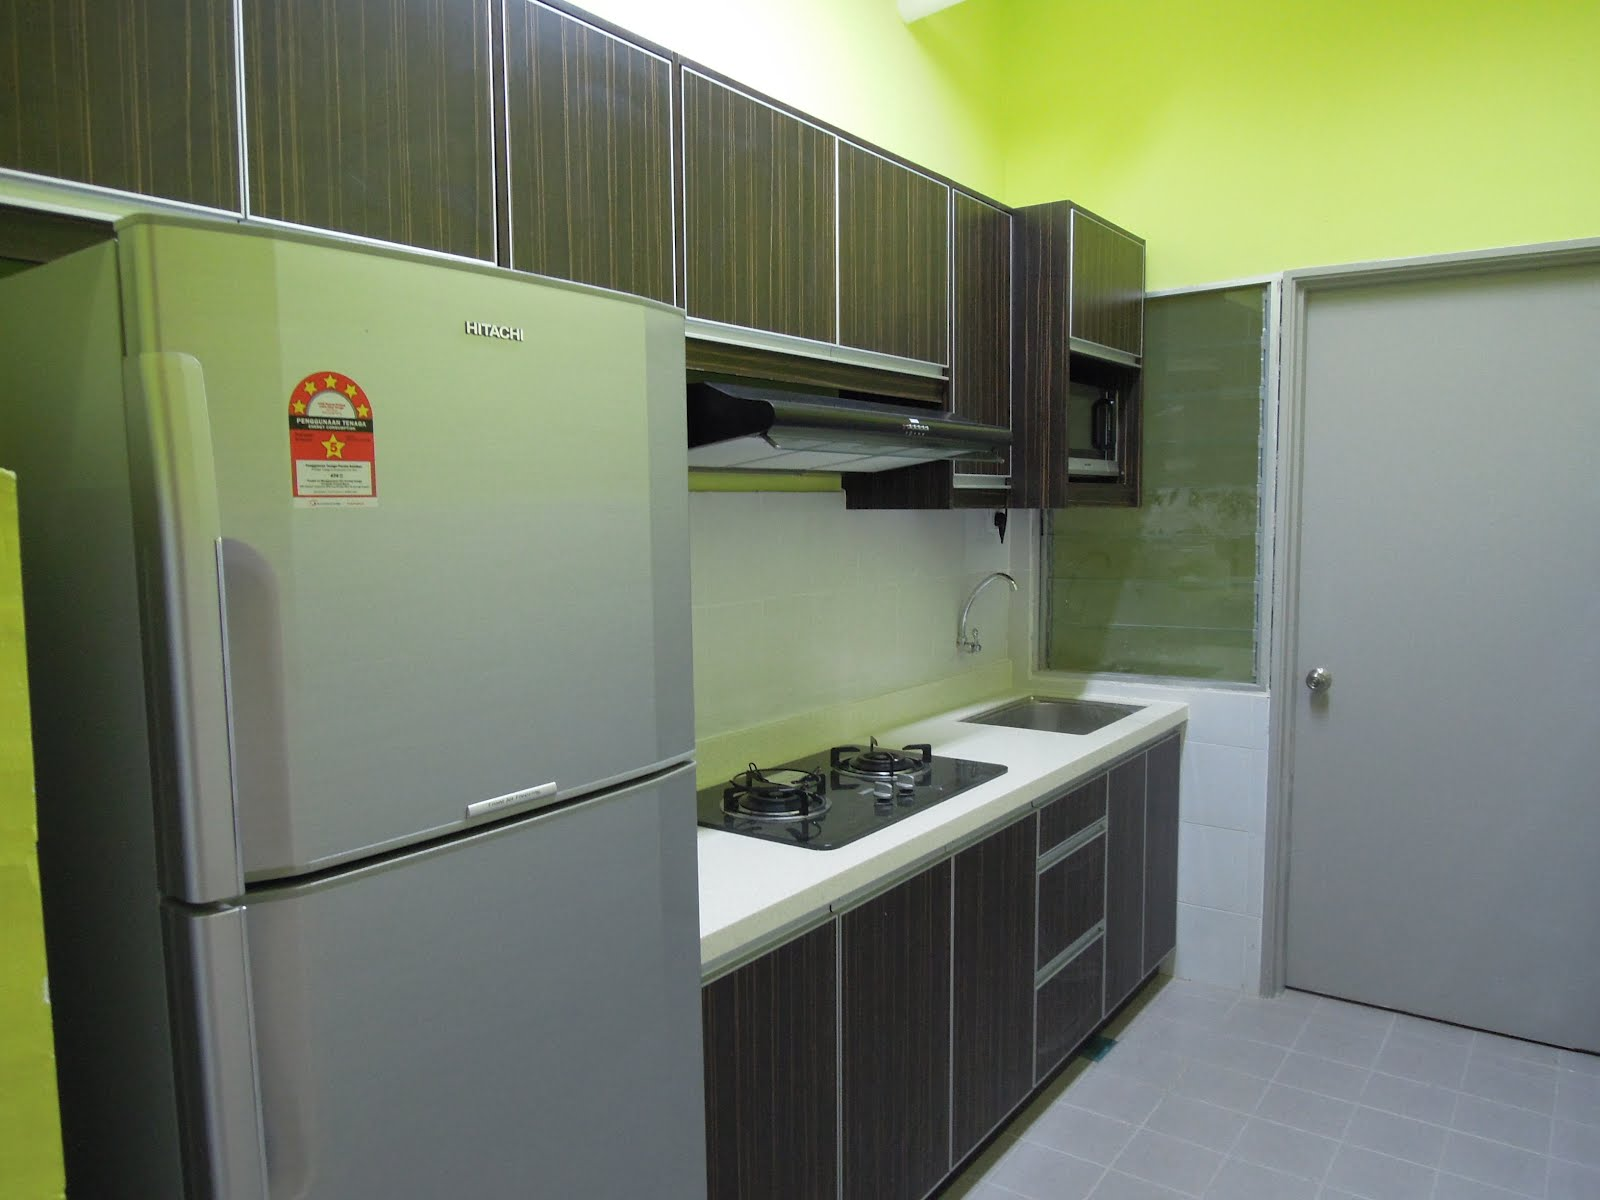 melamine kitchen cabinets calphalon outlet